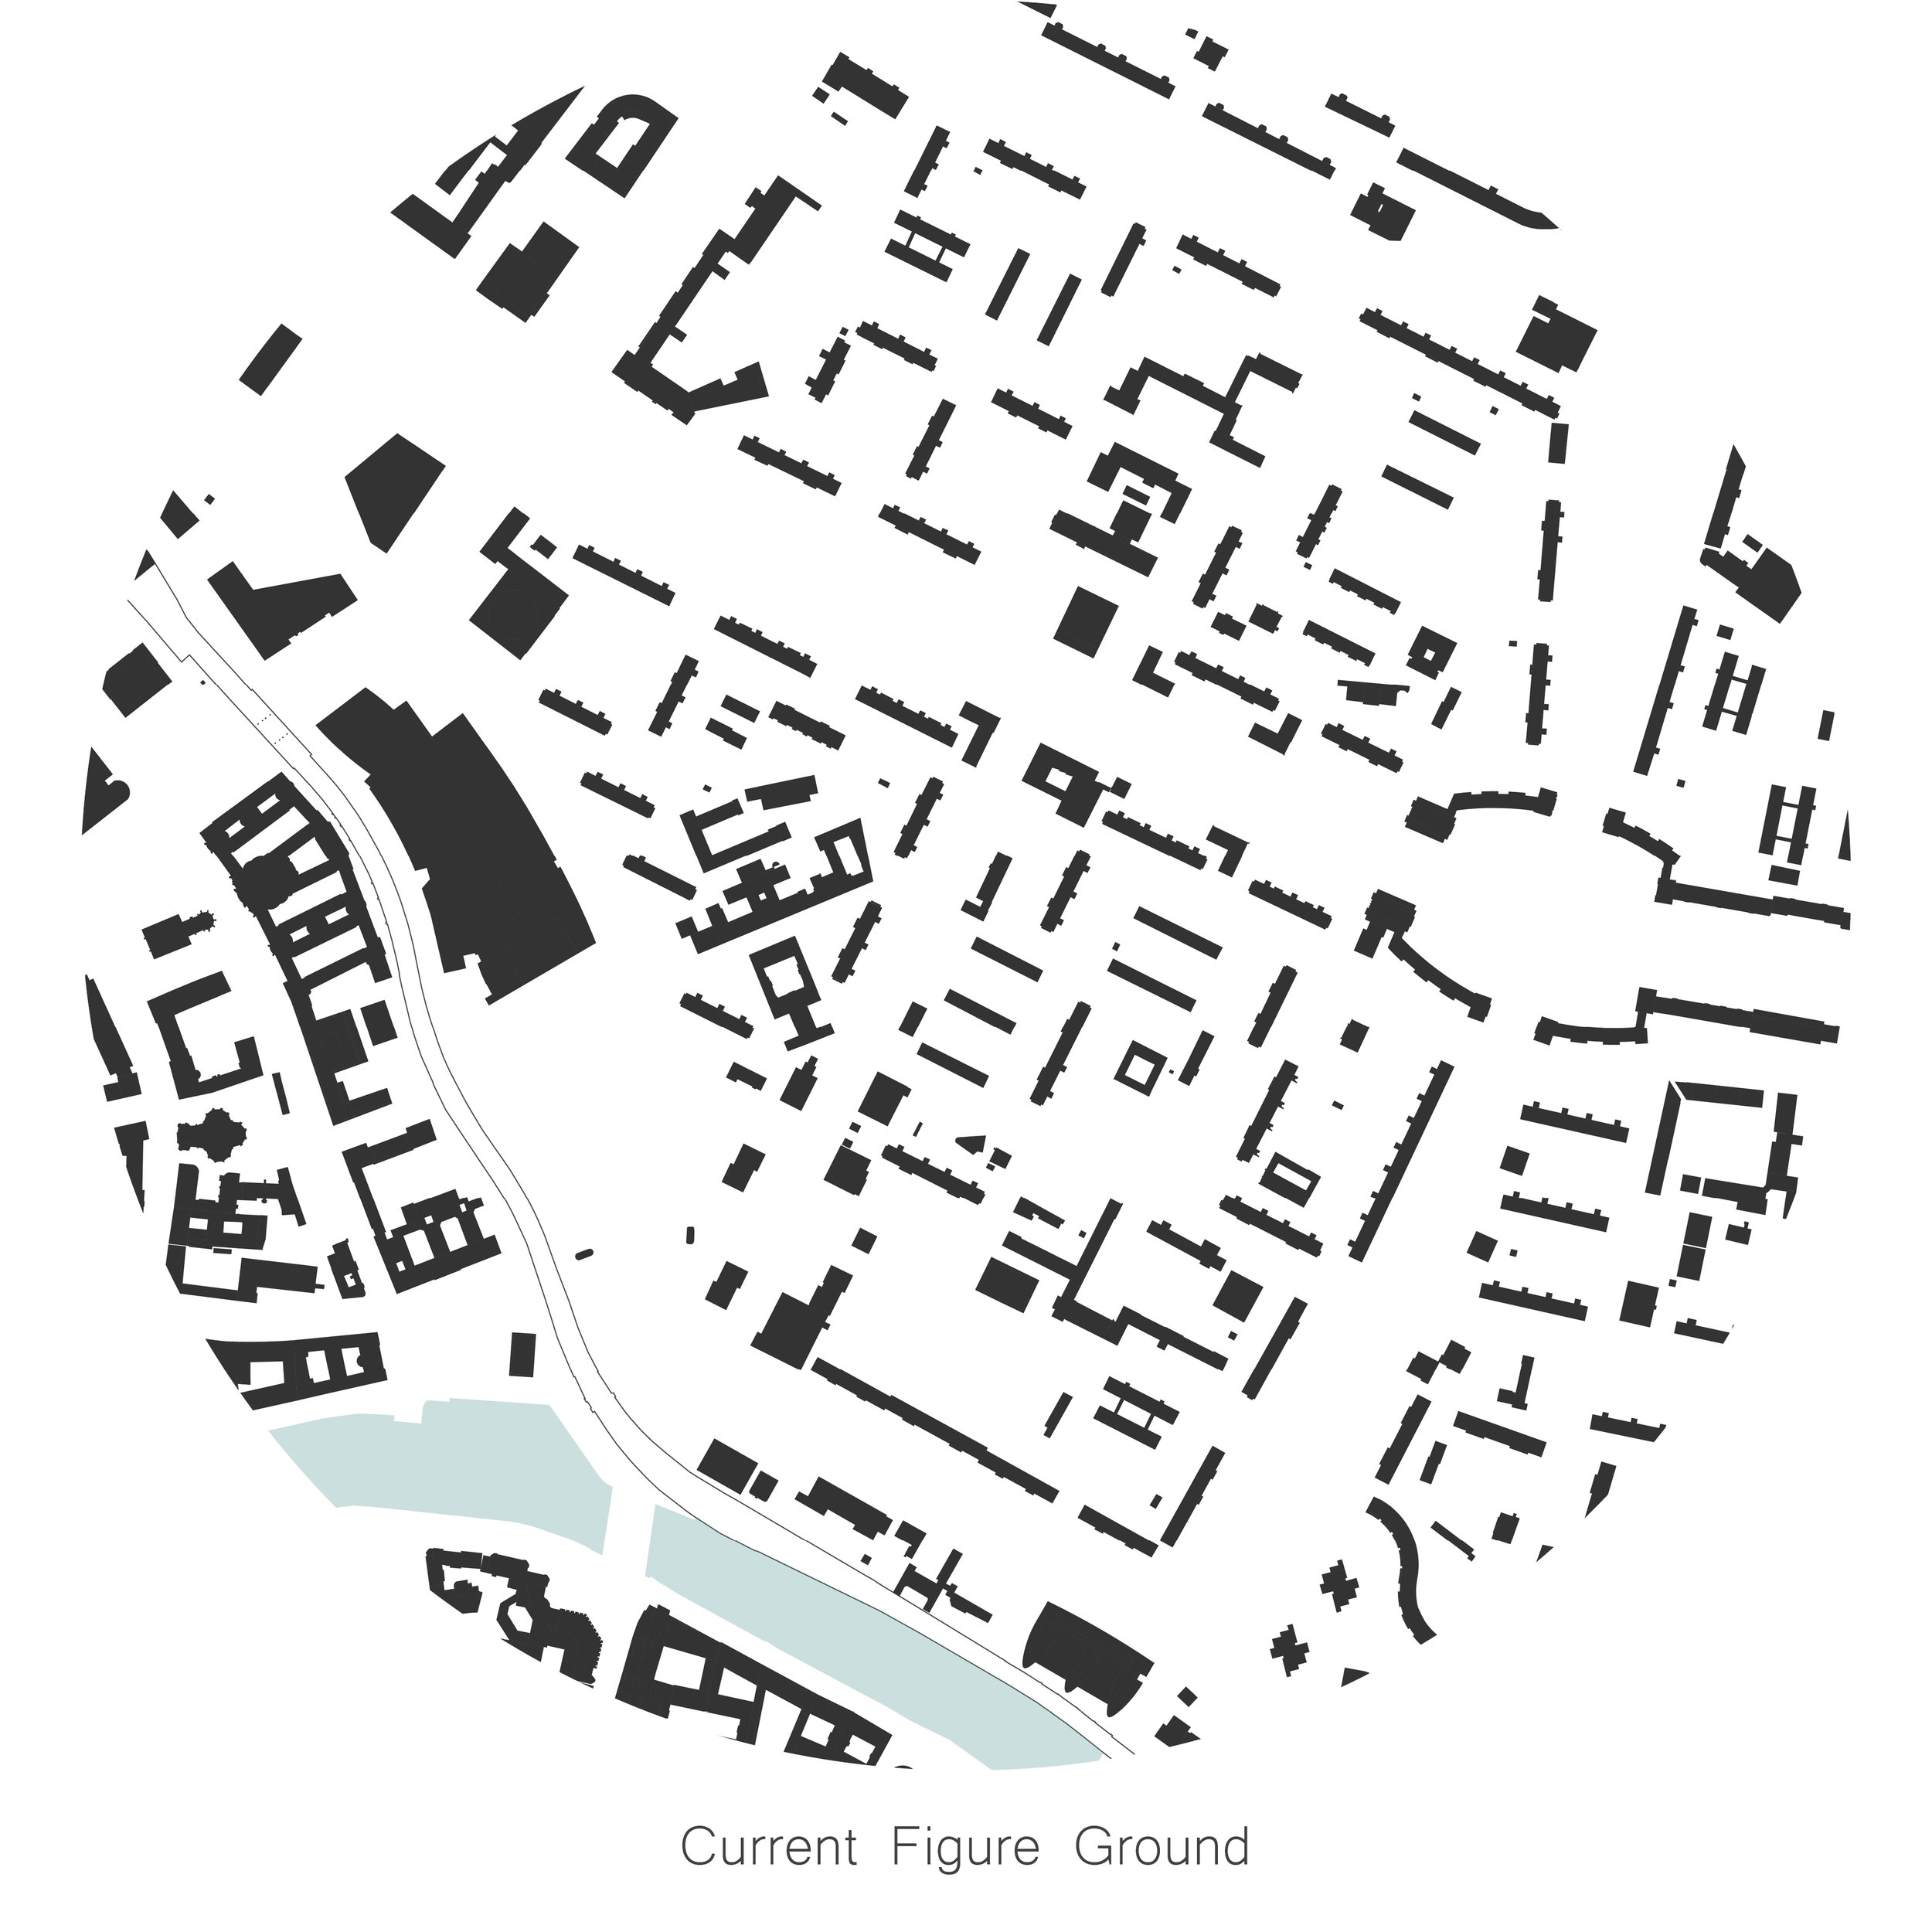 Figure Ground Options.jpg